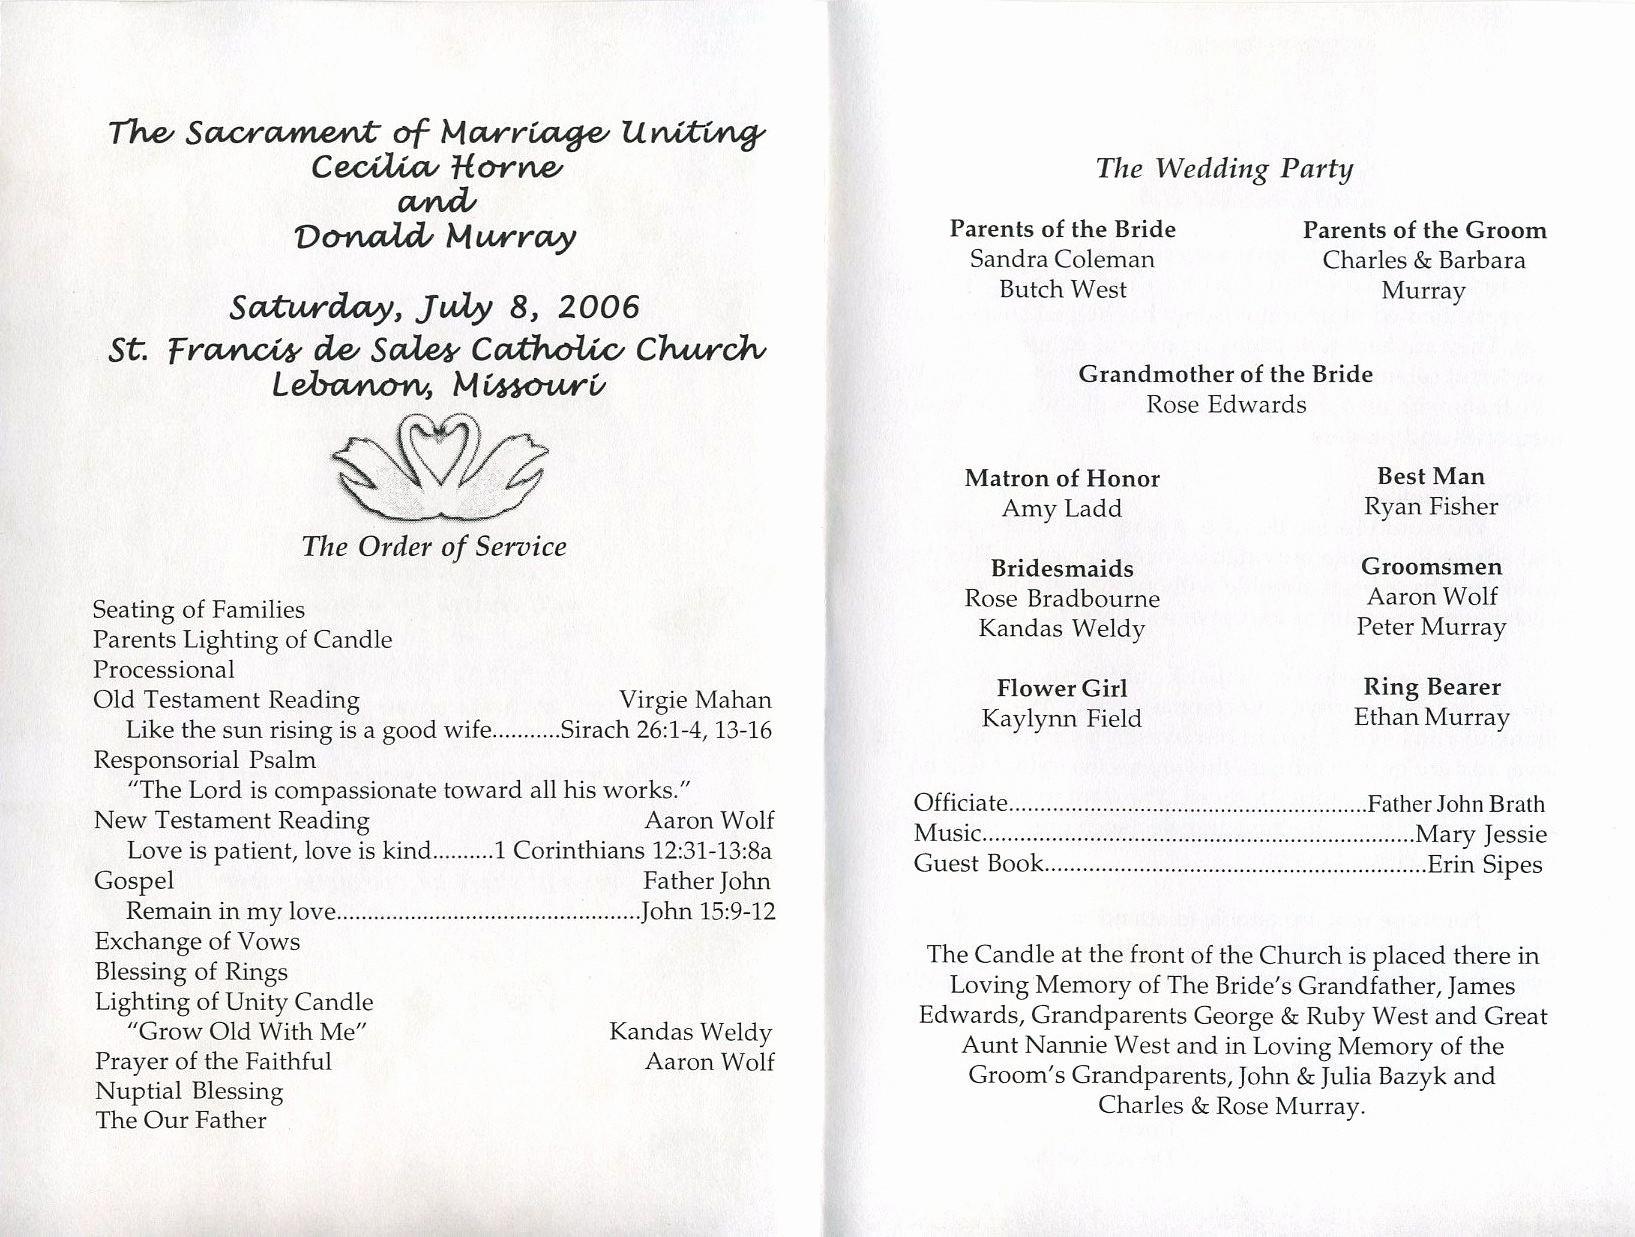 Free Wedding Ceremony Program Template New Free Printable Wedding Programs Templates